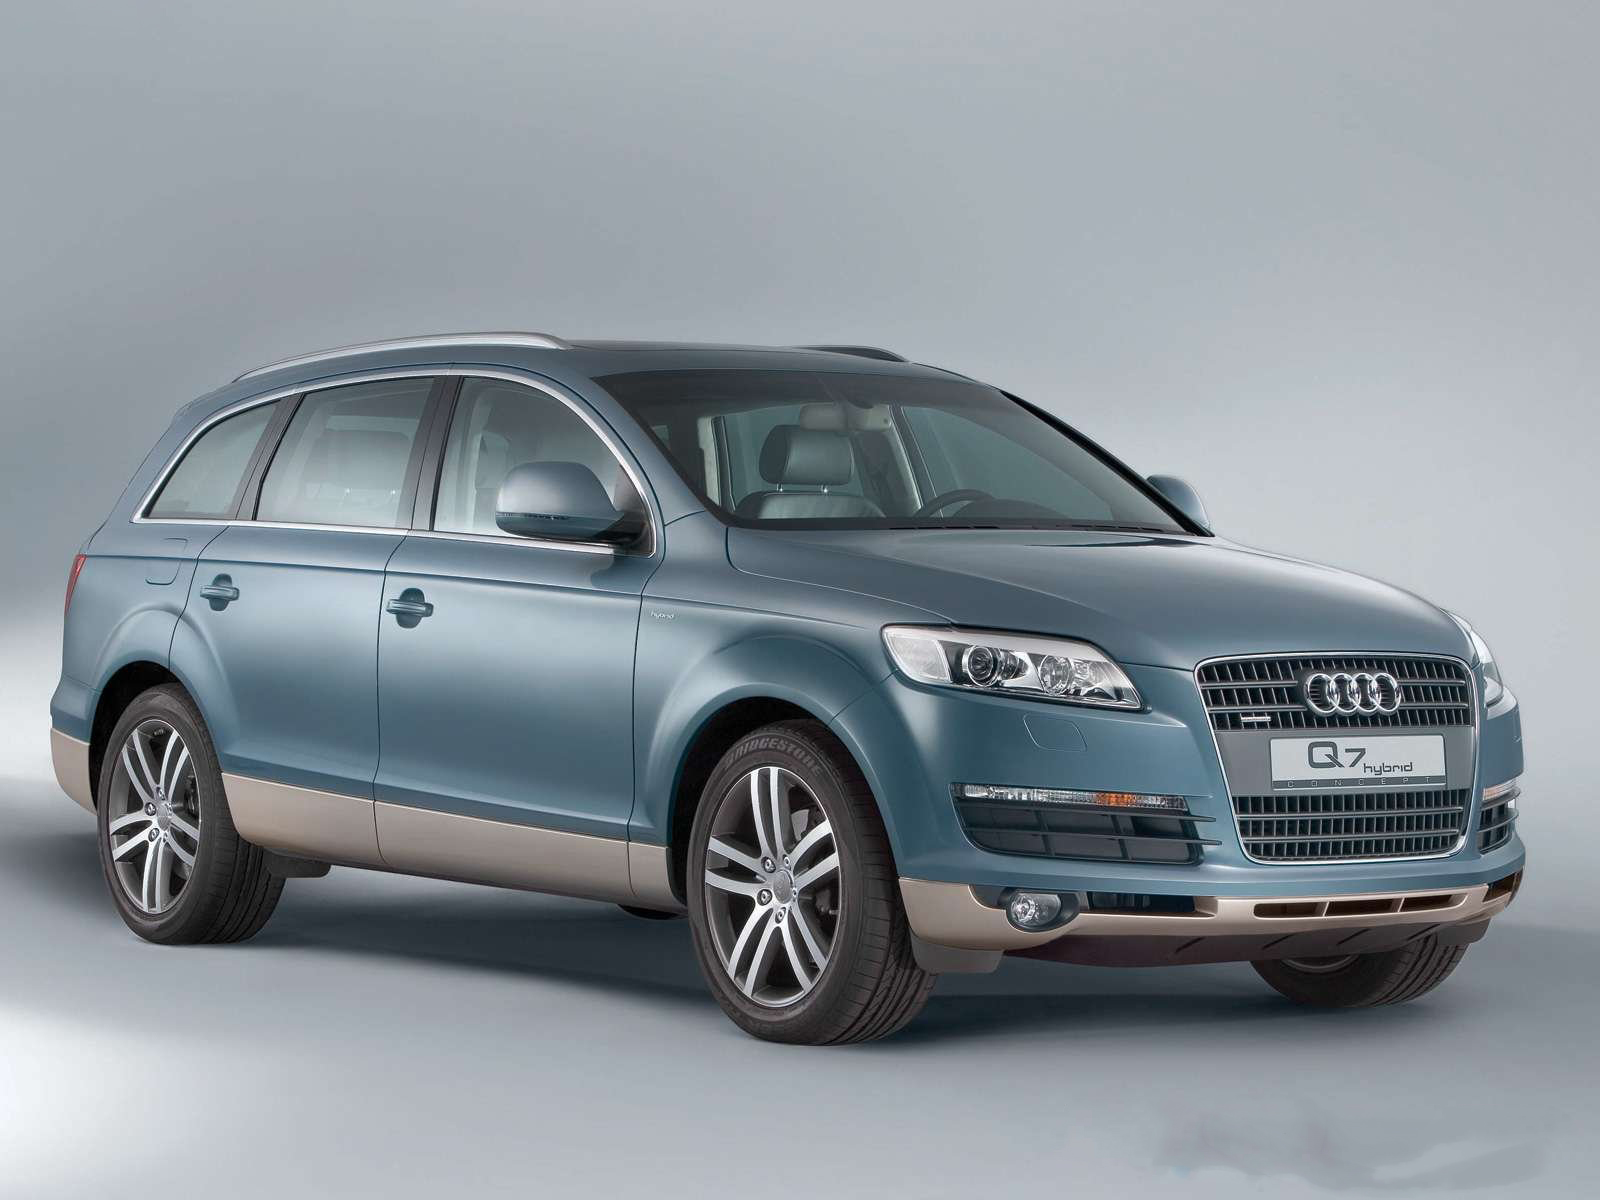 Audi q7 hybrid front view